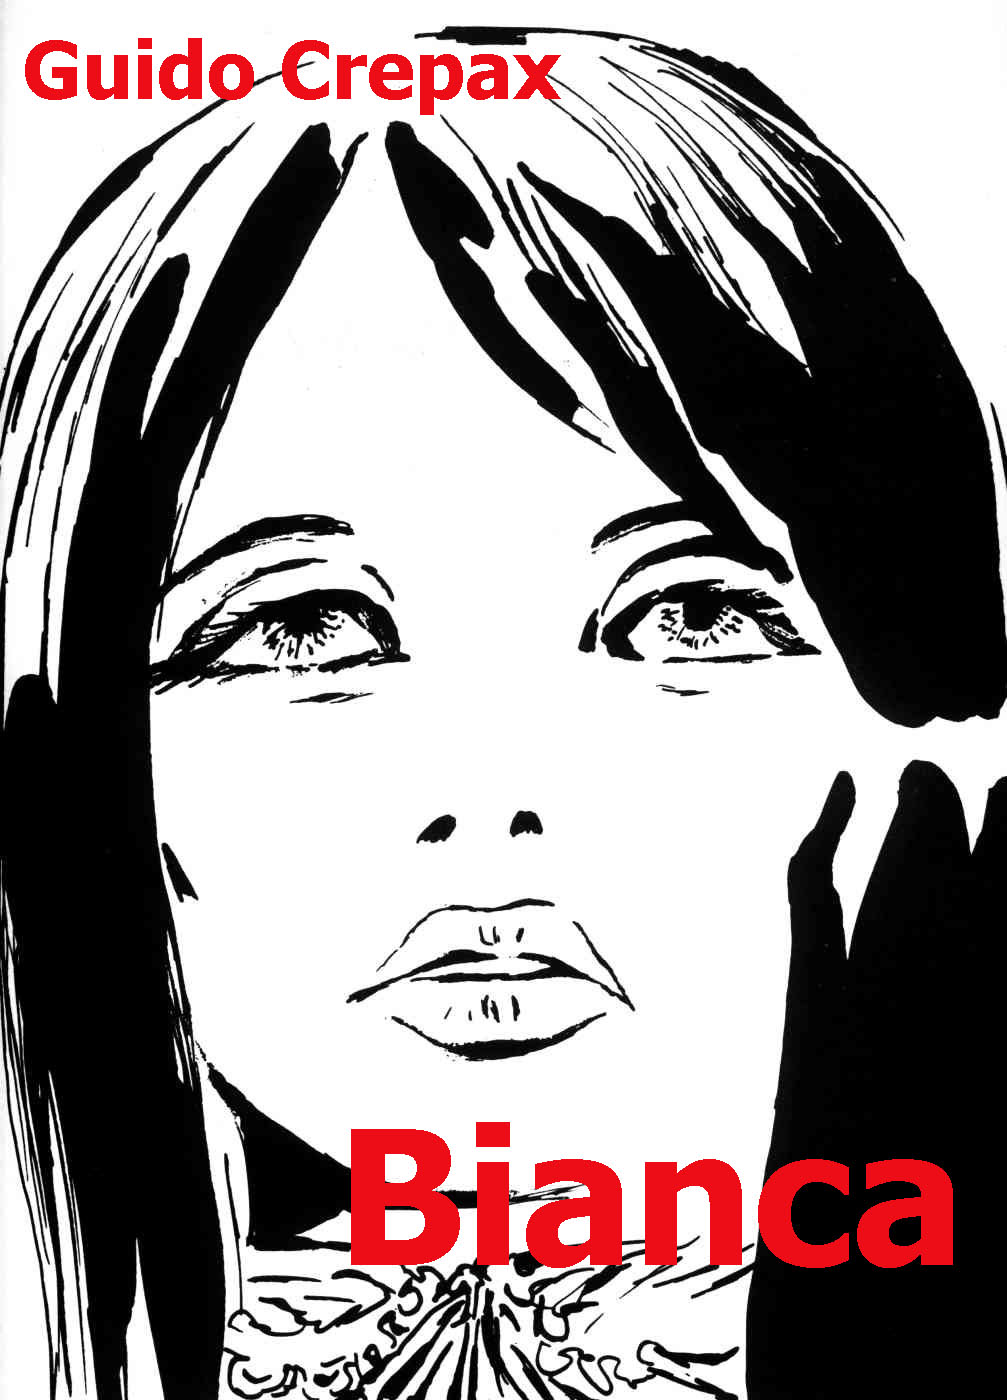 http://2.bp.blogspot.com/_YMMFLJJXT8Y/TG1j5-eLUcI/AAAAAAAAC5I/lBrv5kPtNAY/s1600/Guido+Crepax+-+Bianca-001.JPG